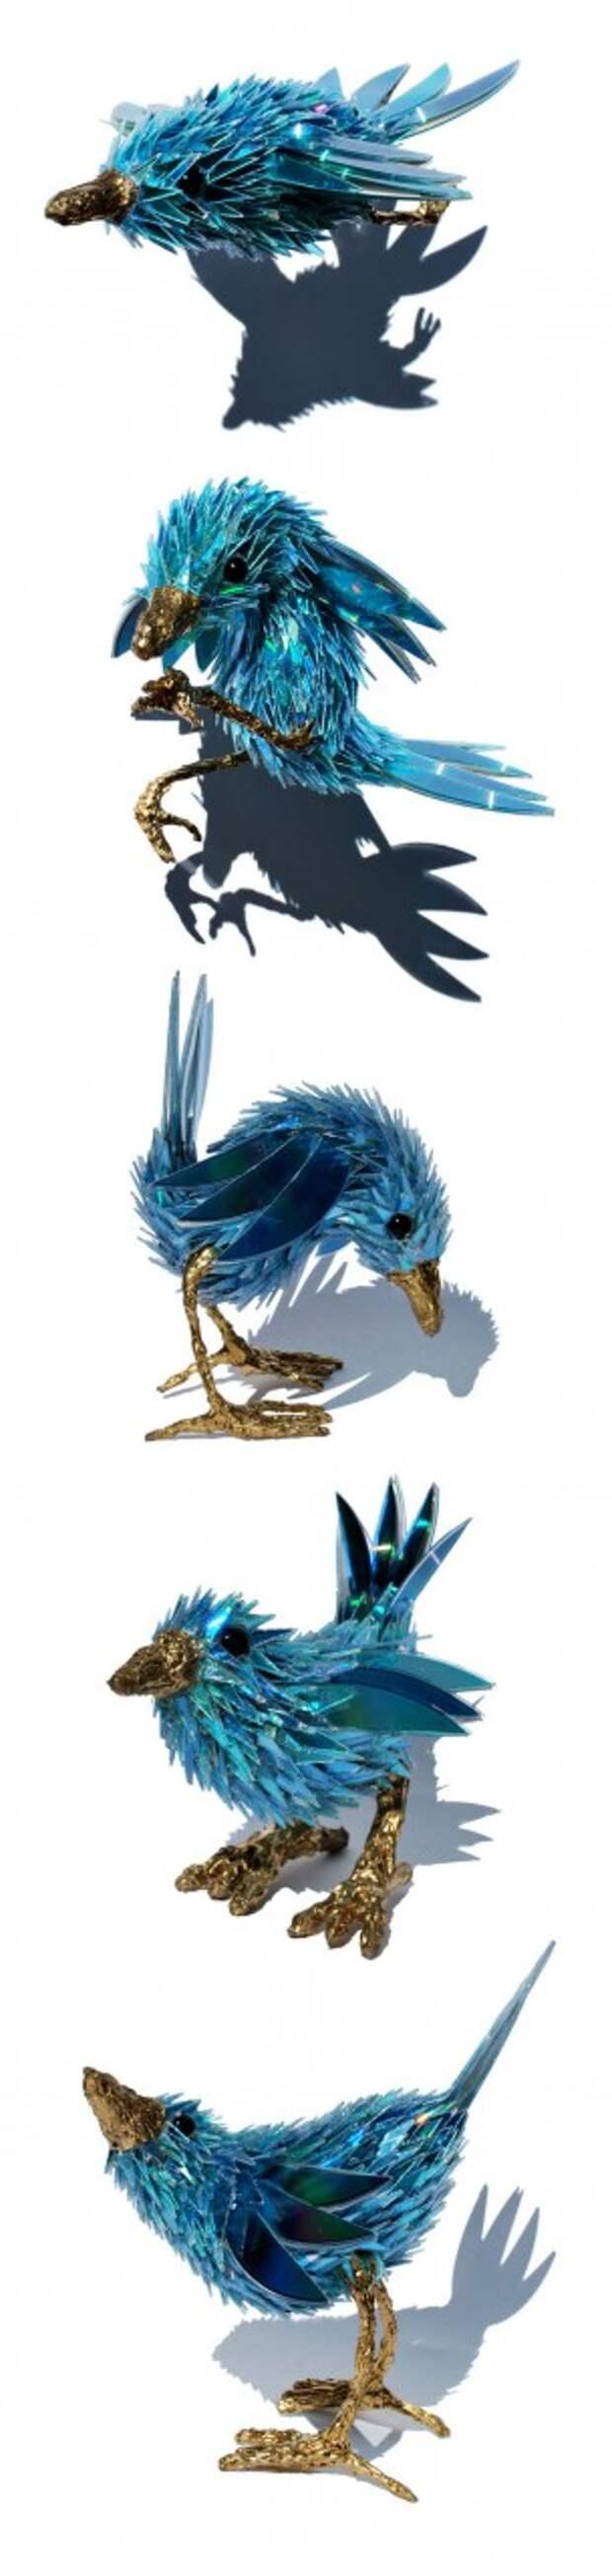 blue_wren_series_by_seanavery-d387oc9.jpg